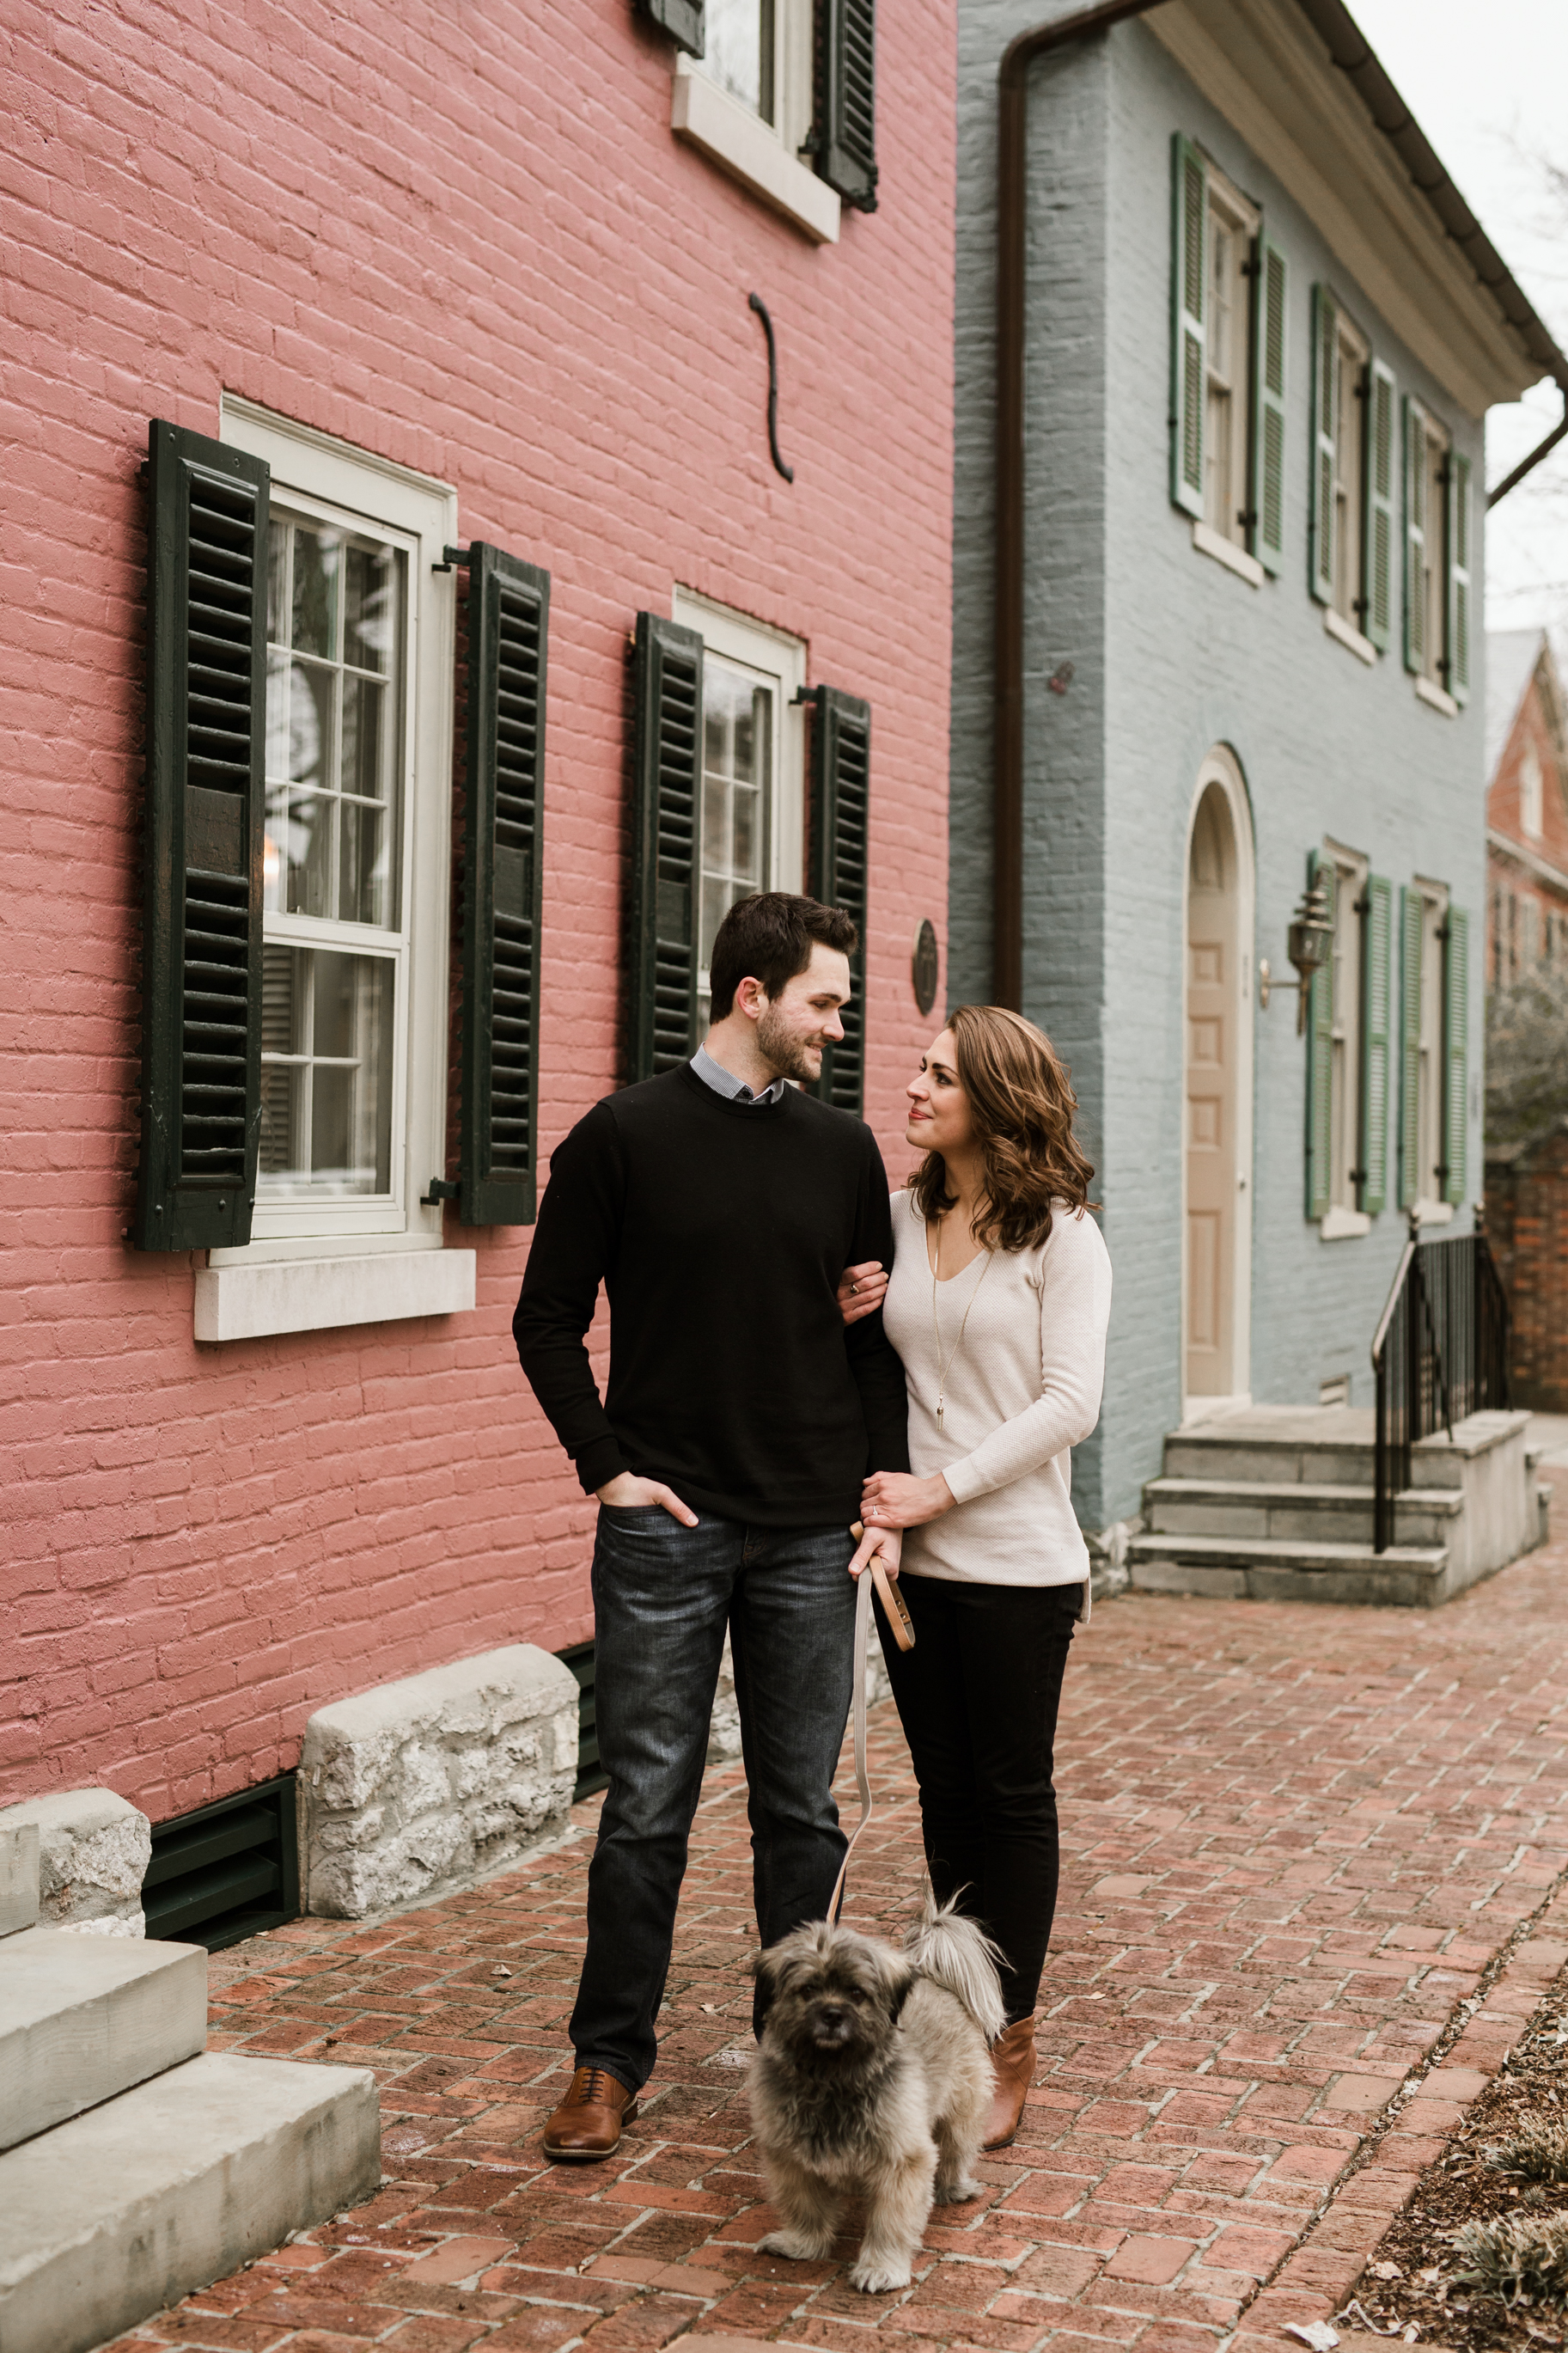 Ellen & Lee Engagement 2018 WEBSITE SP Crystal Ludwick Photo (44 of 54).jpg